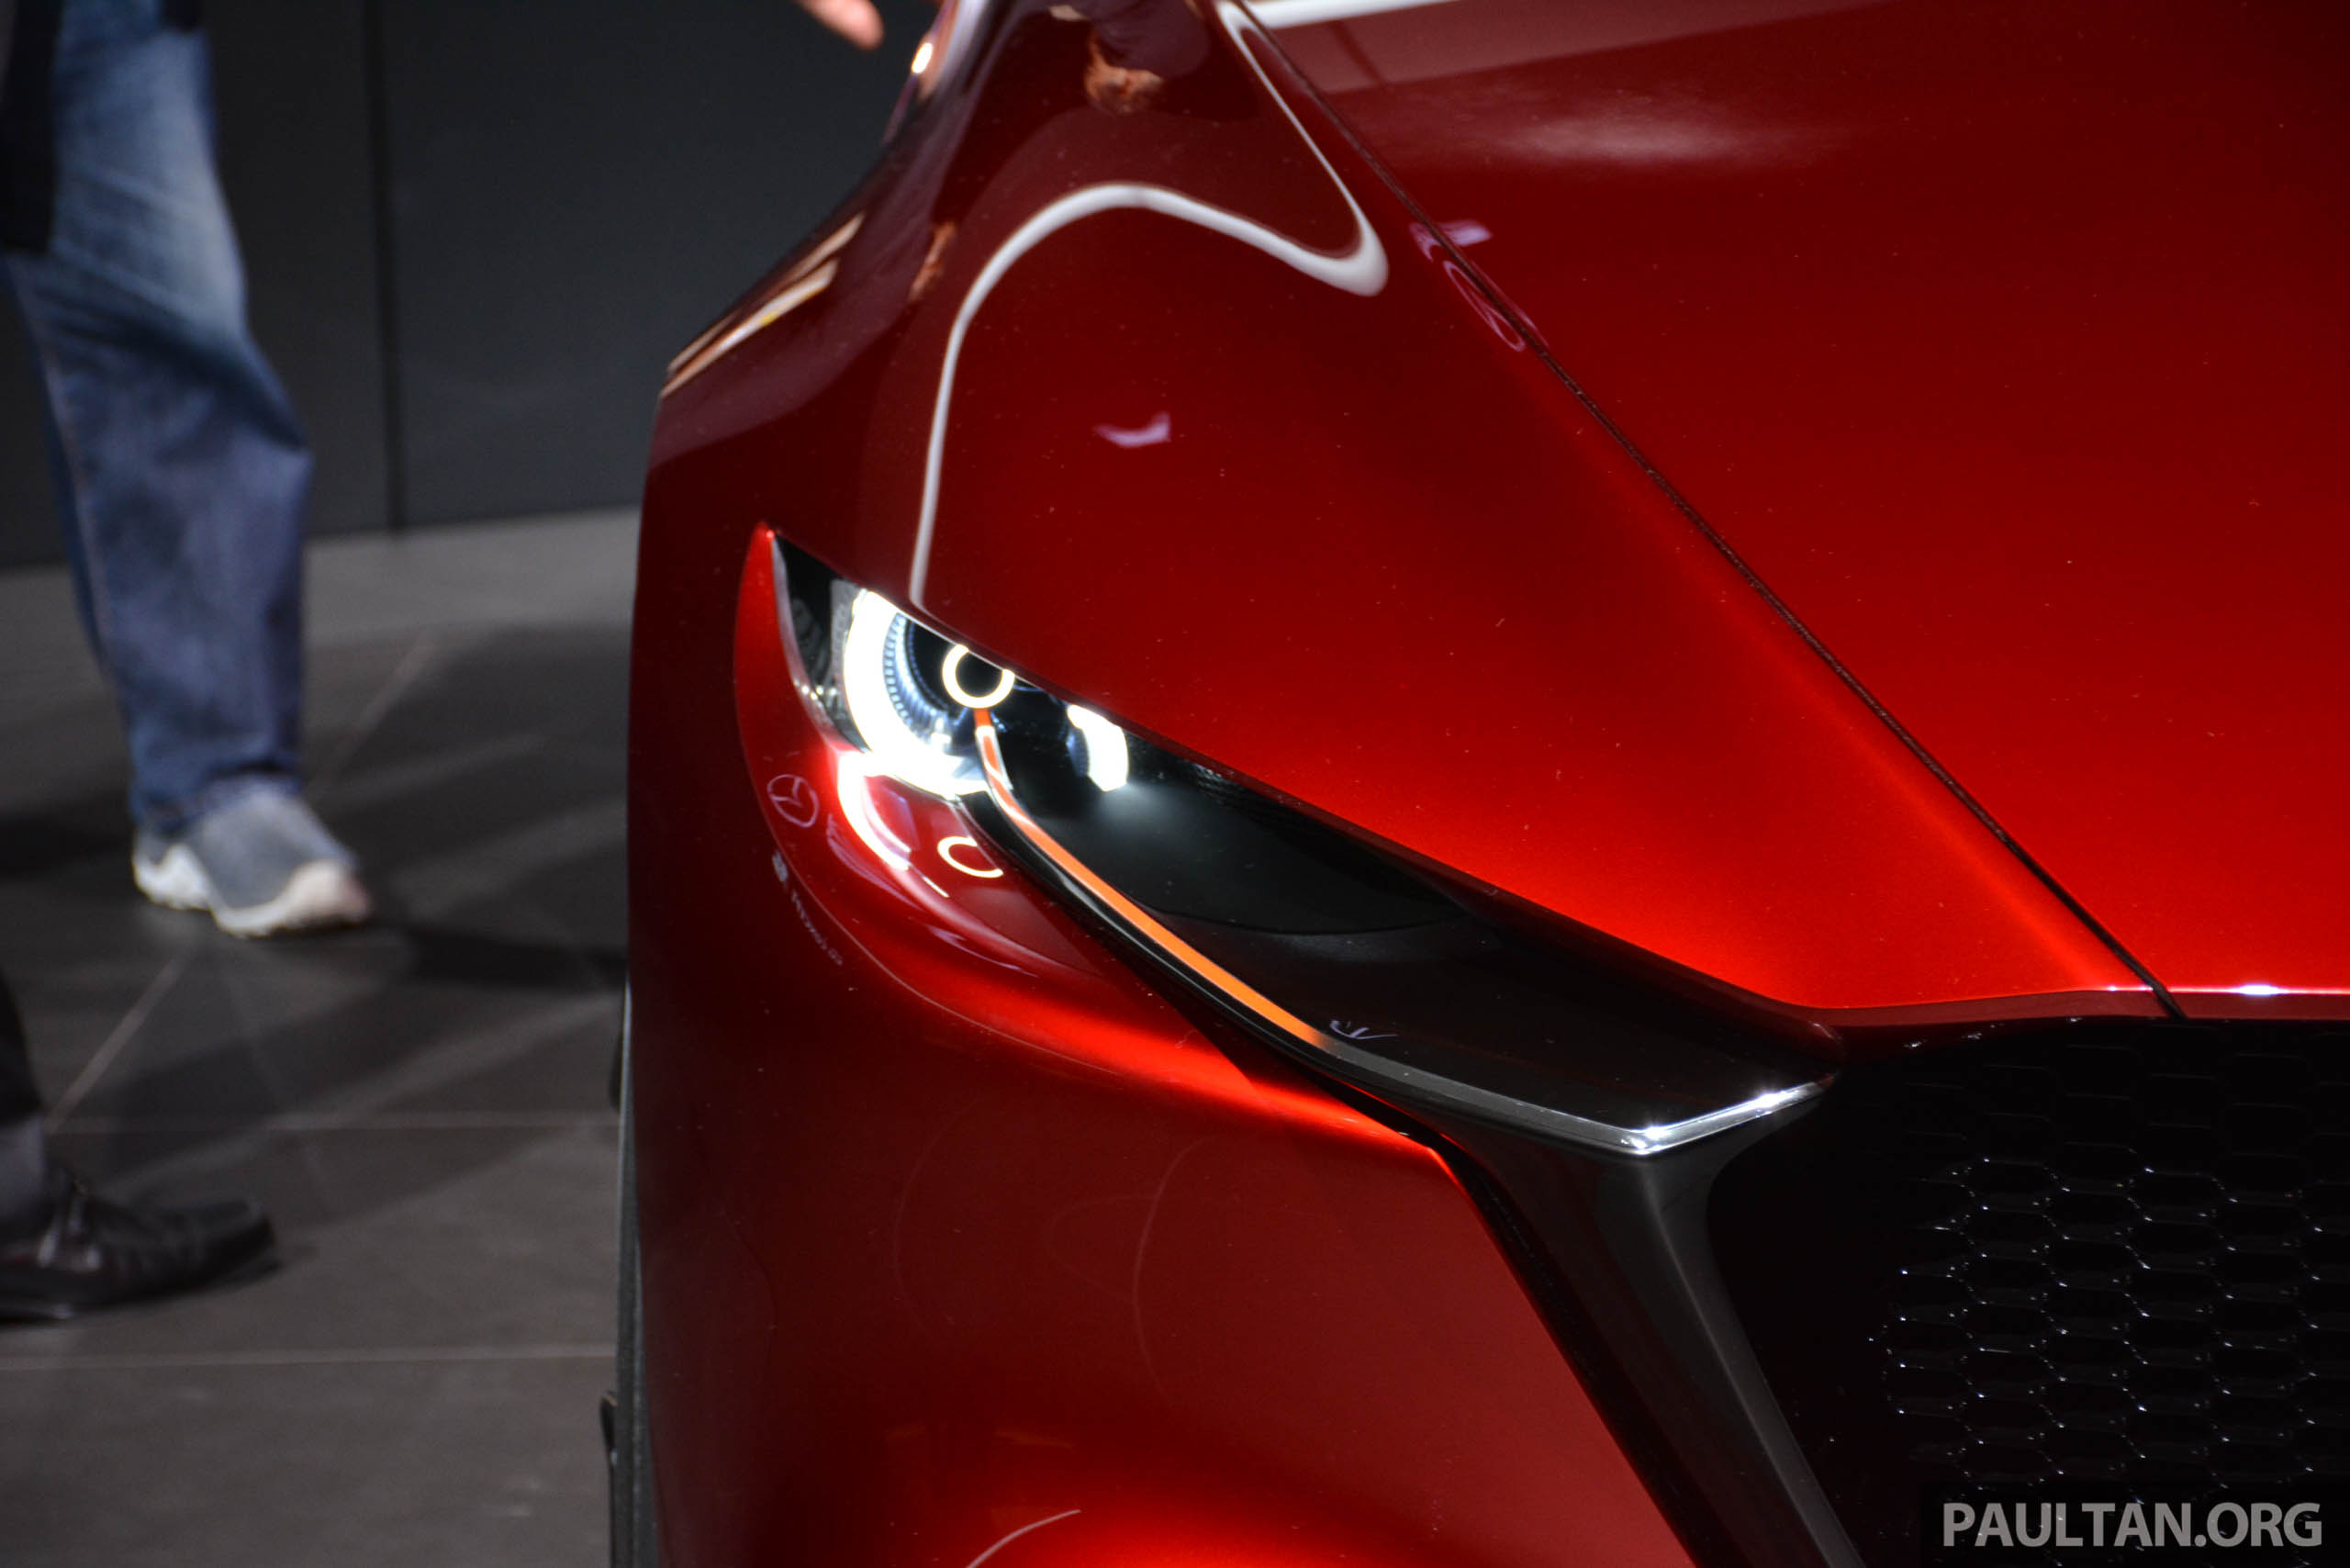 Captivating 2017 Mazda Kai Concept Ideas - Best Image Cars - desej.us